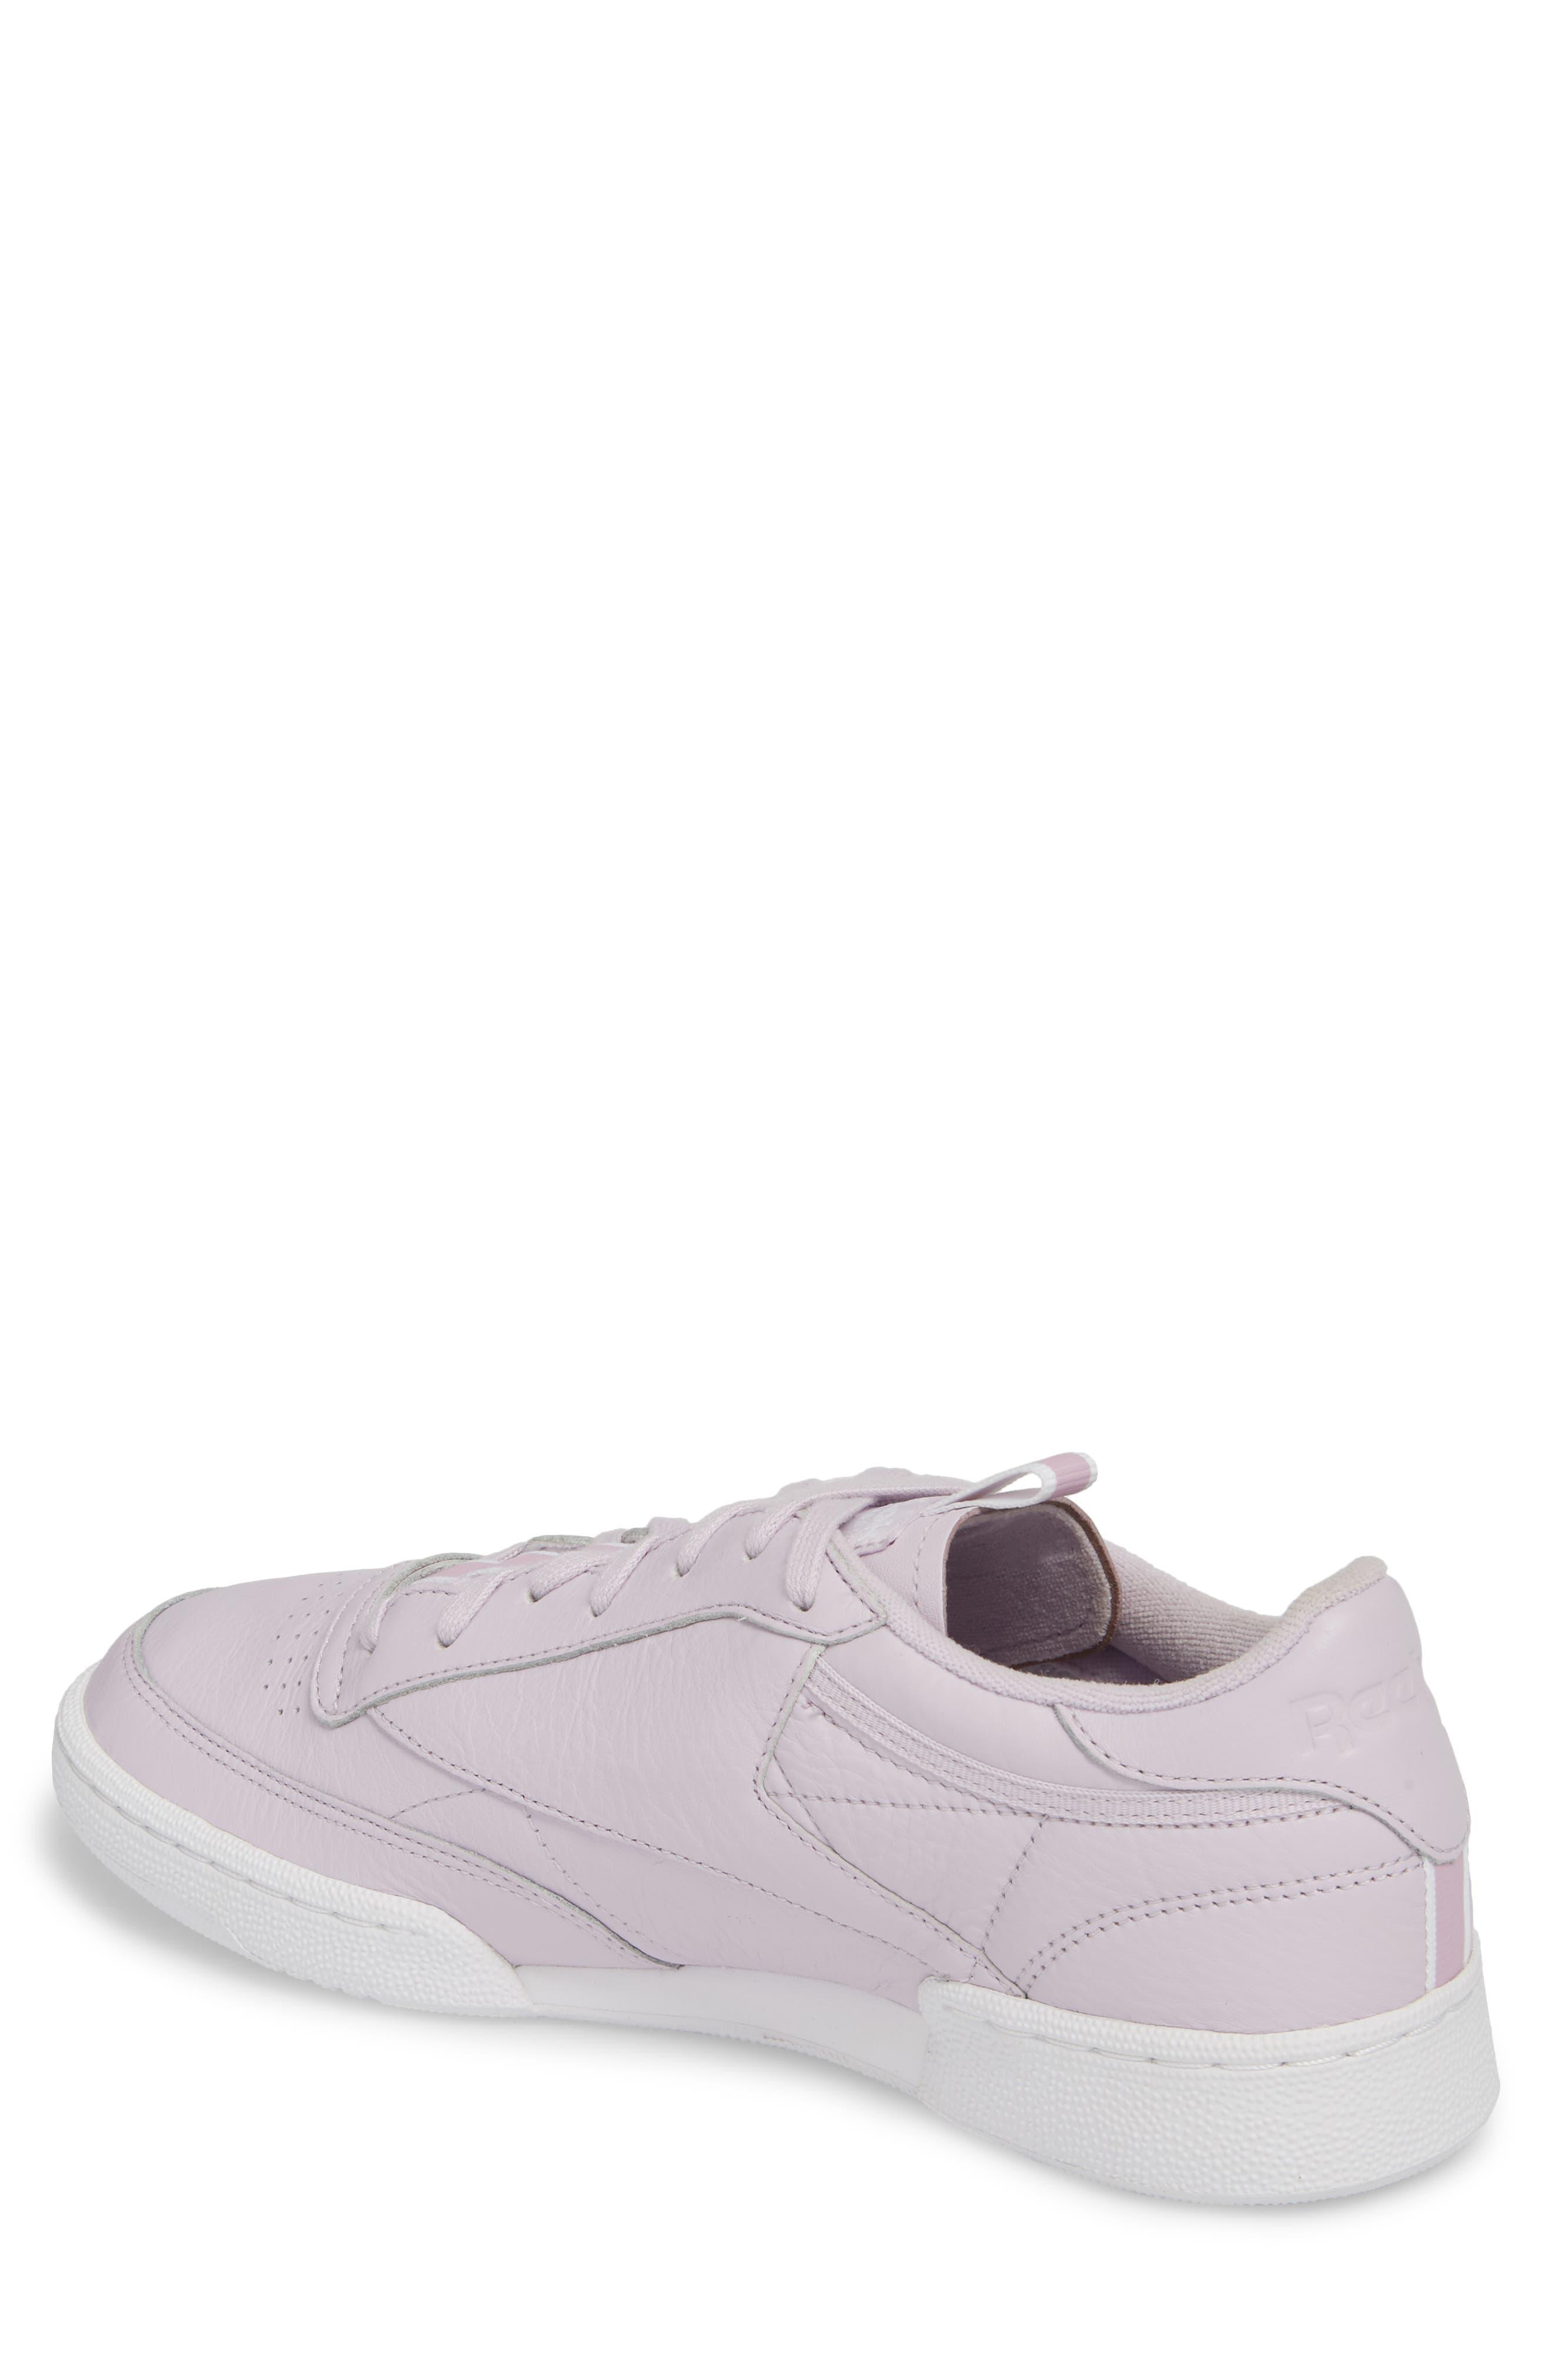 Club C 85 RT Sneaker,                             Alternate thumbnail 2, color,                             Quartz/ White/ Purple Fog